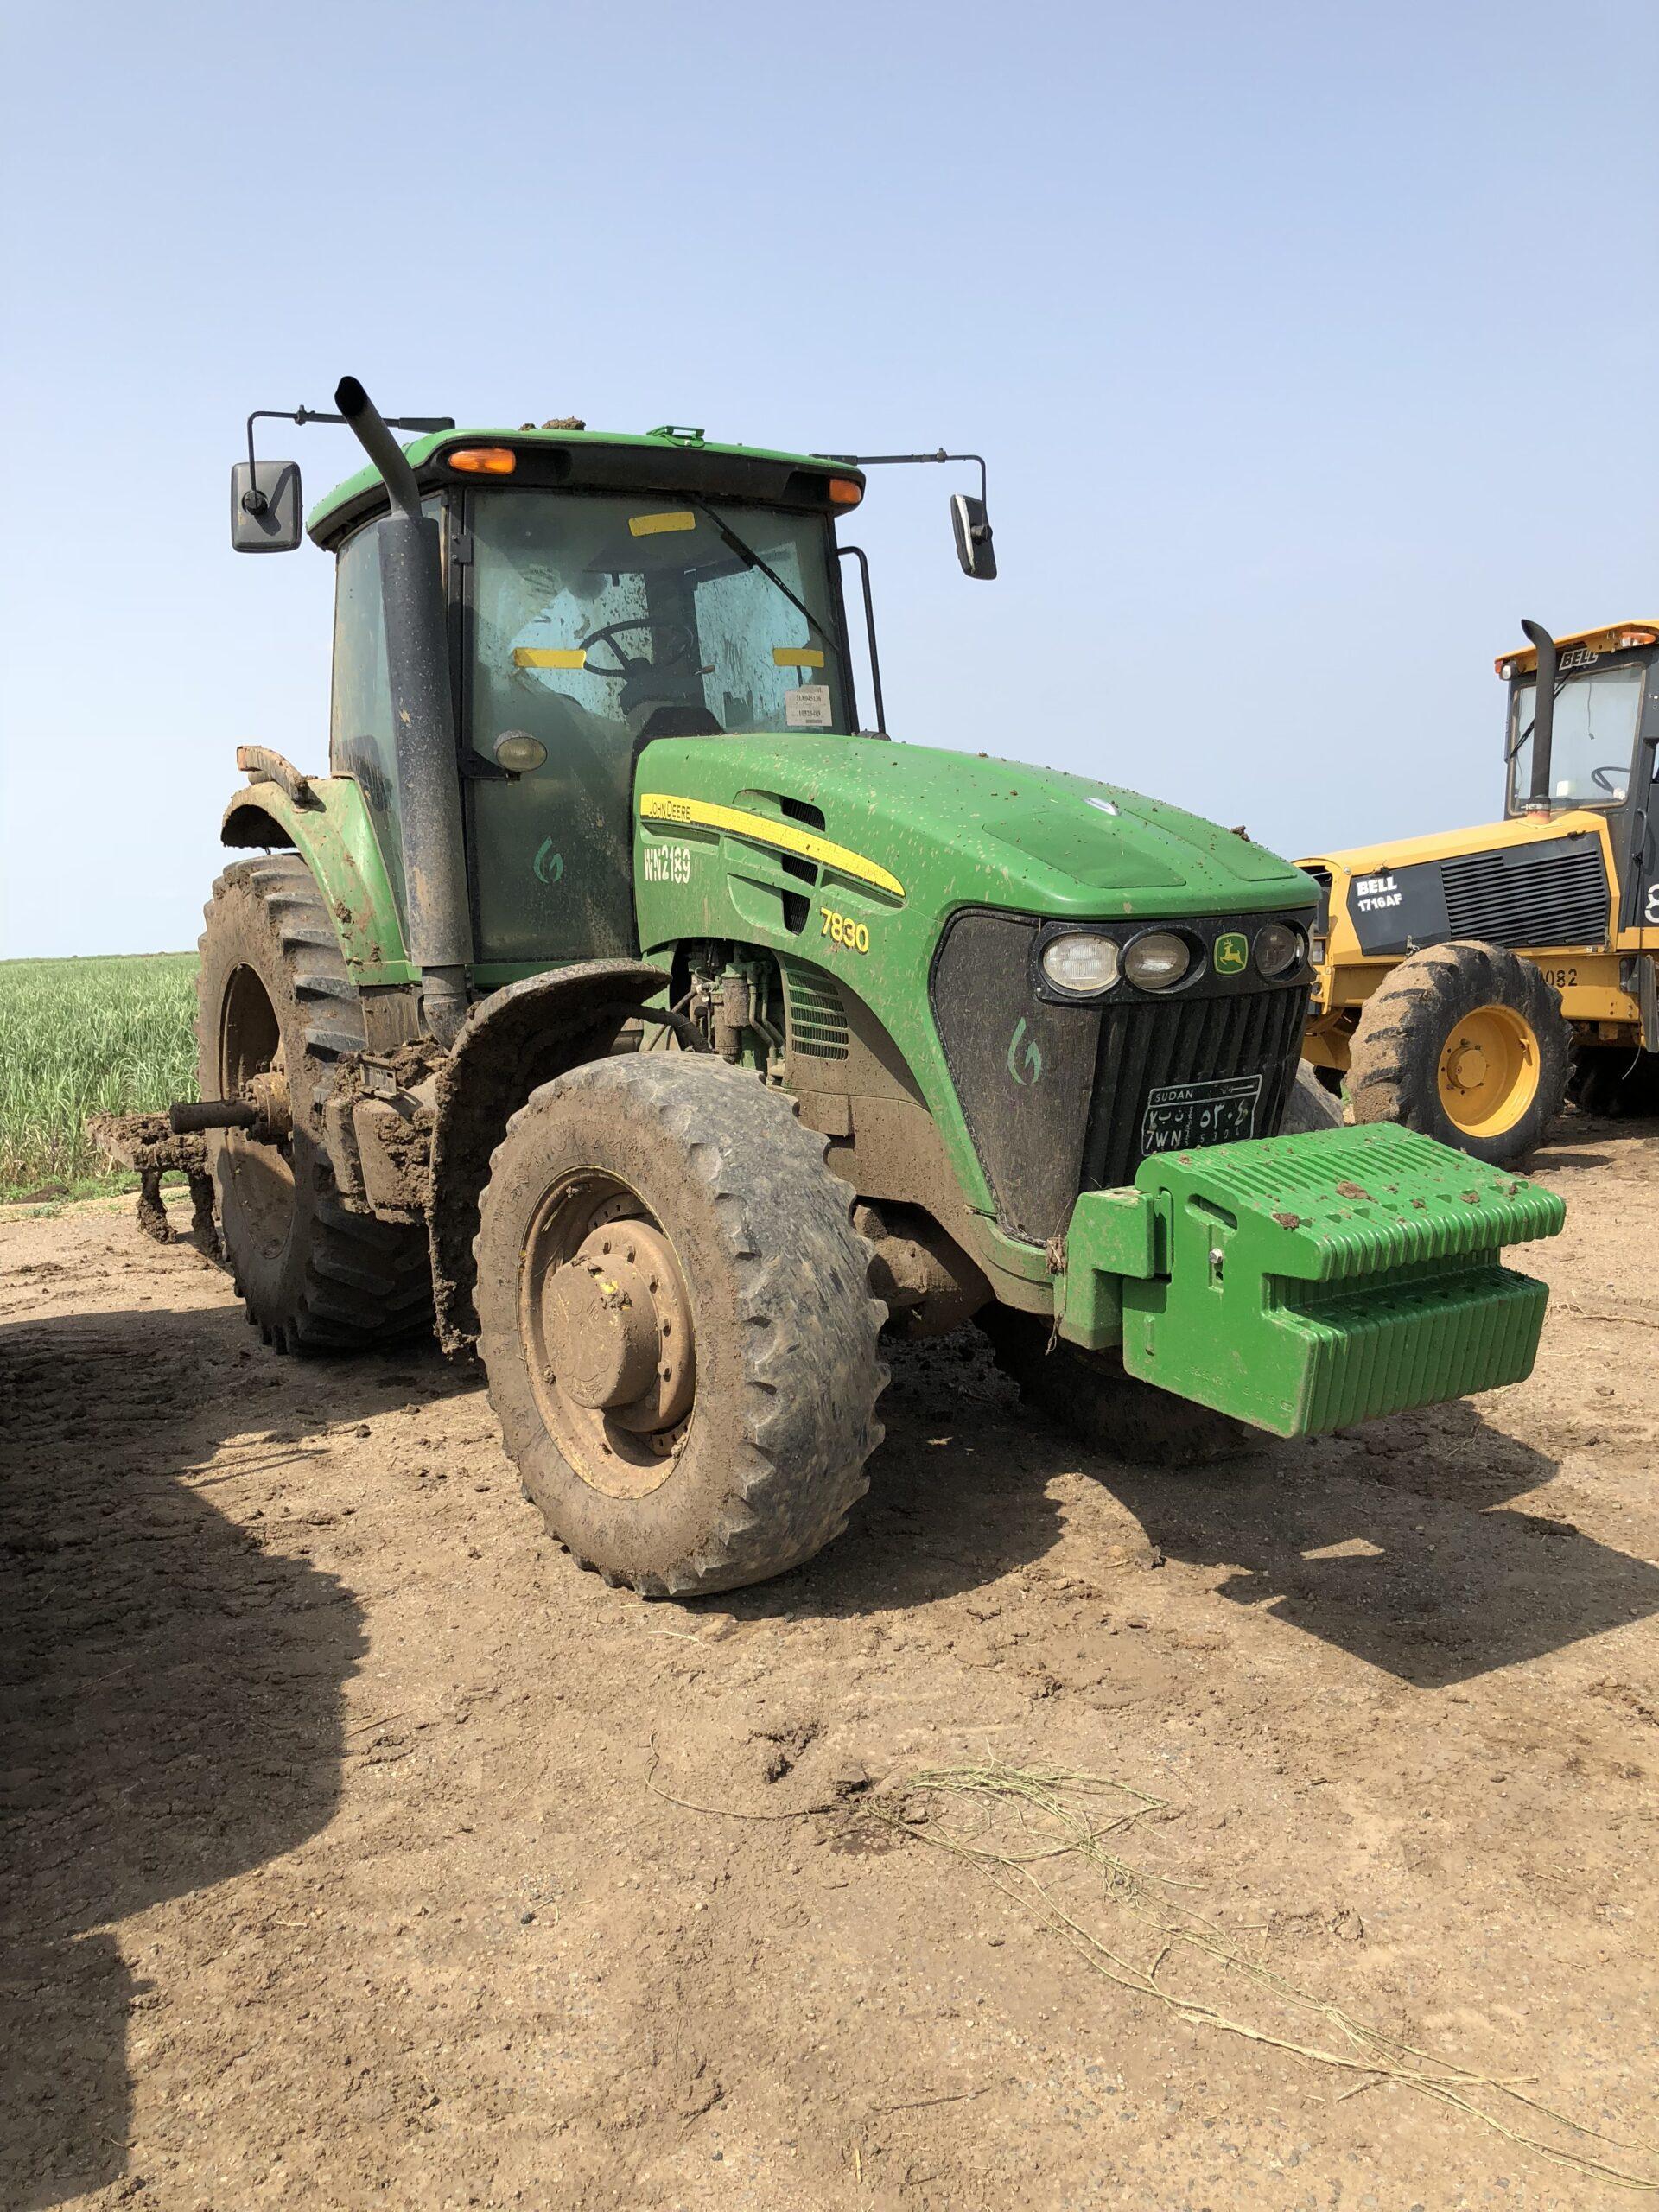 Tanzania: Overhaul and maintenance on tractors